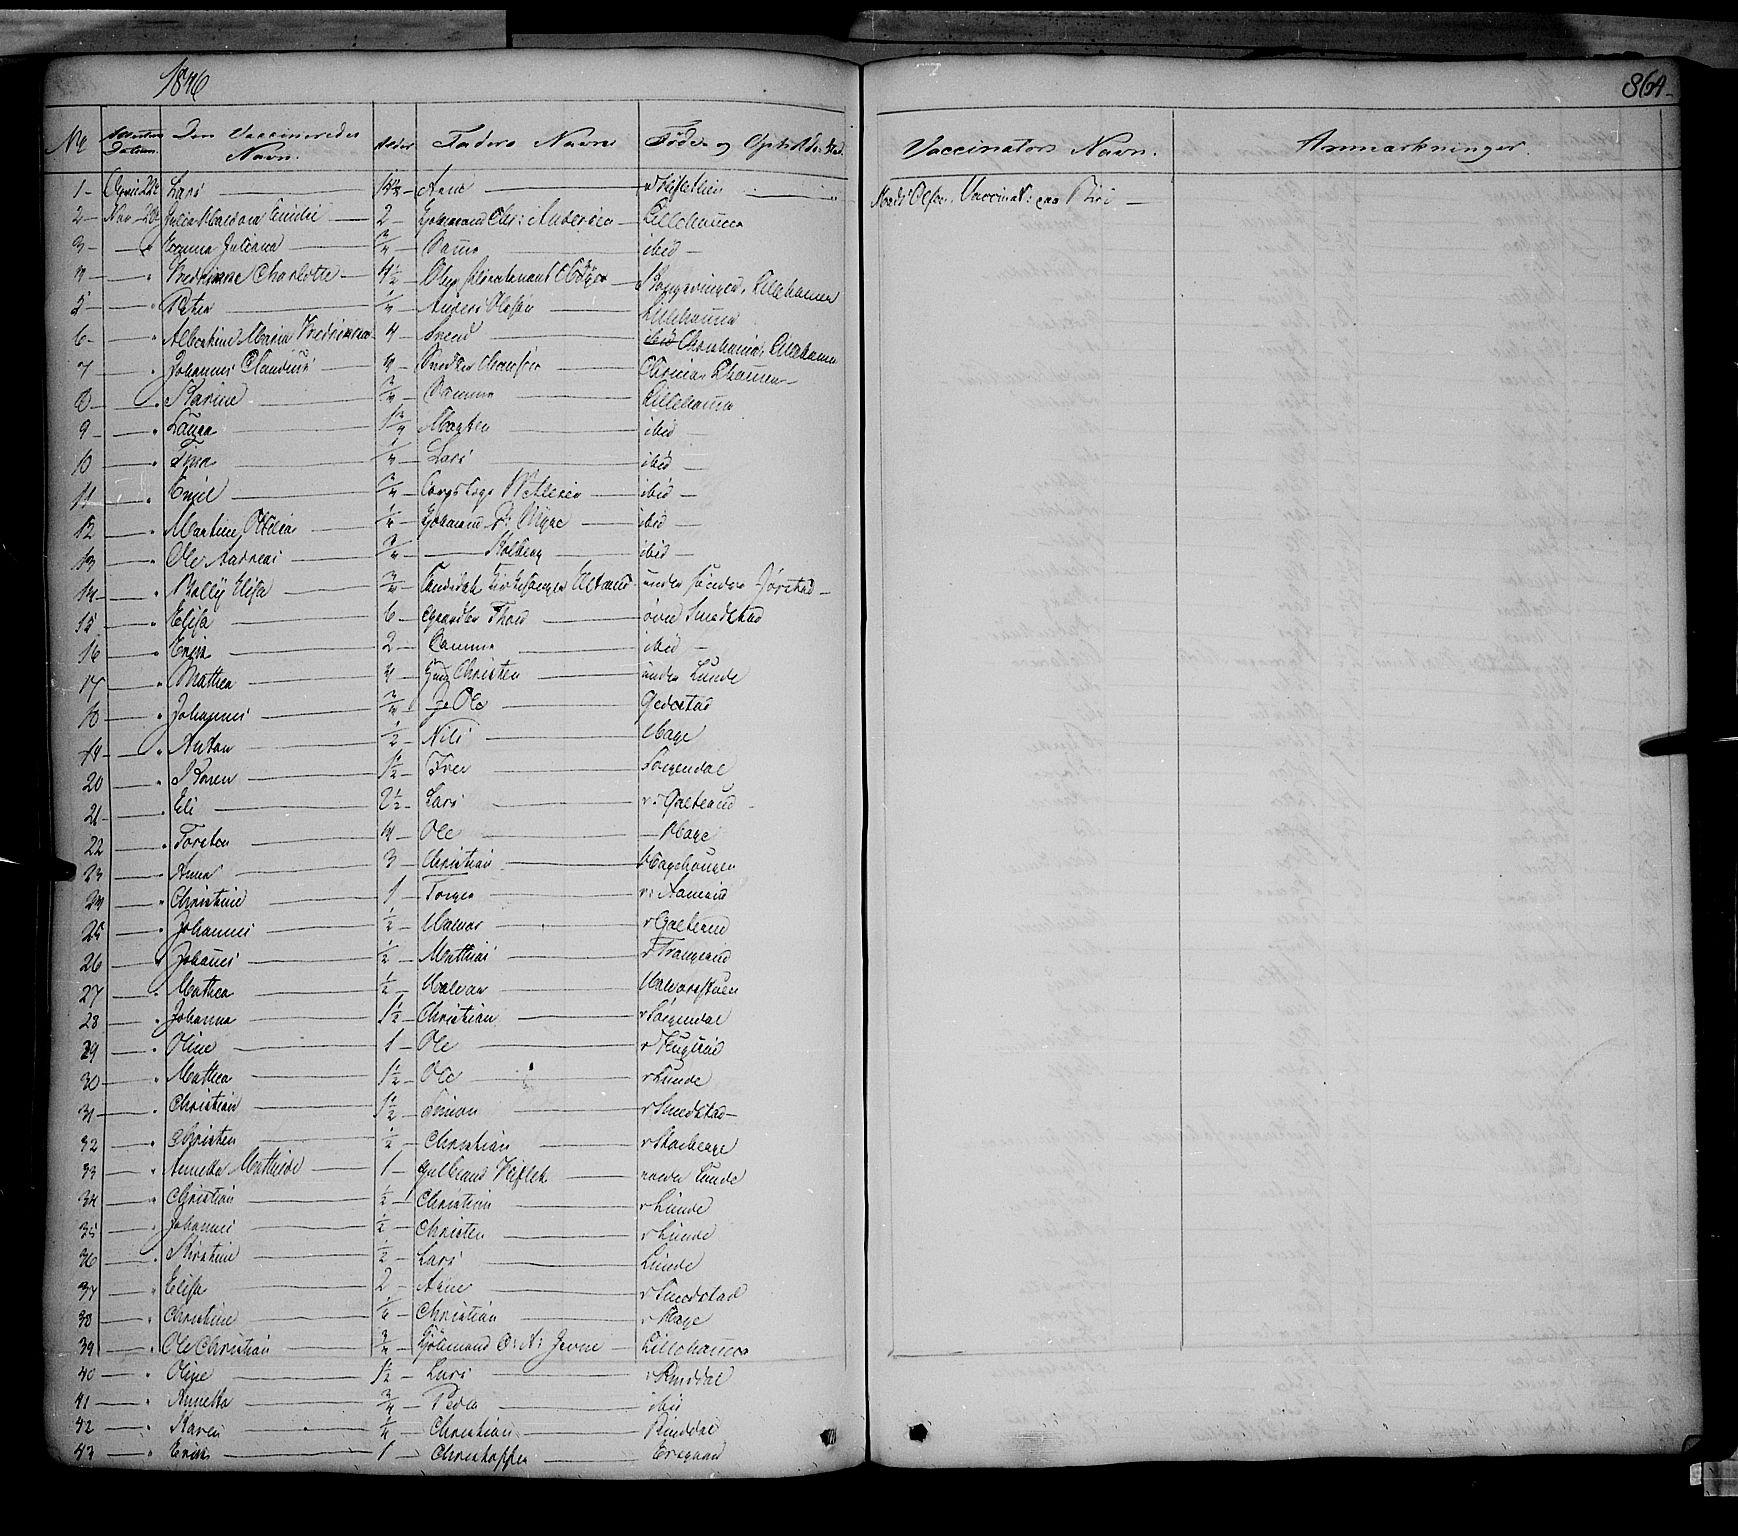 SAH, Fåberg prestekontor, Ministerialbok nr. 5, 1836-1854, s. 863-864